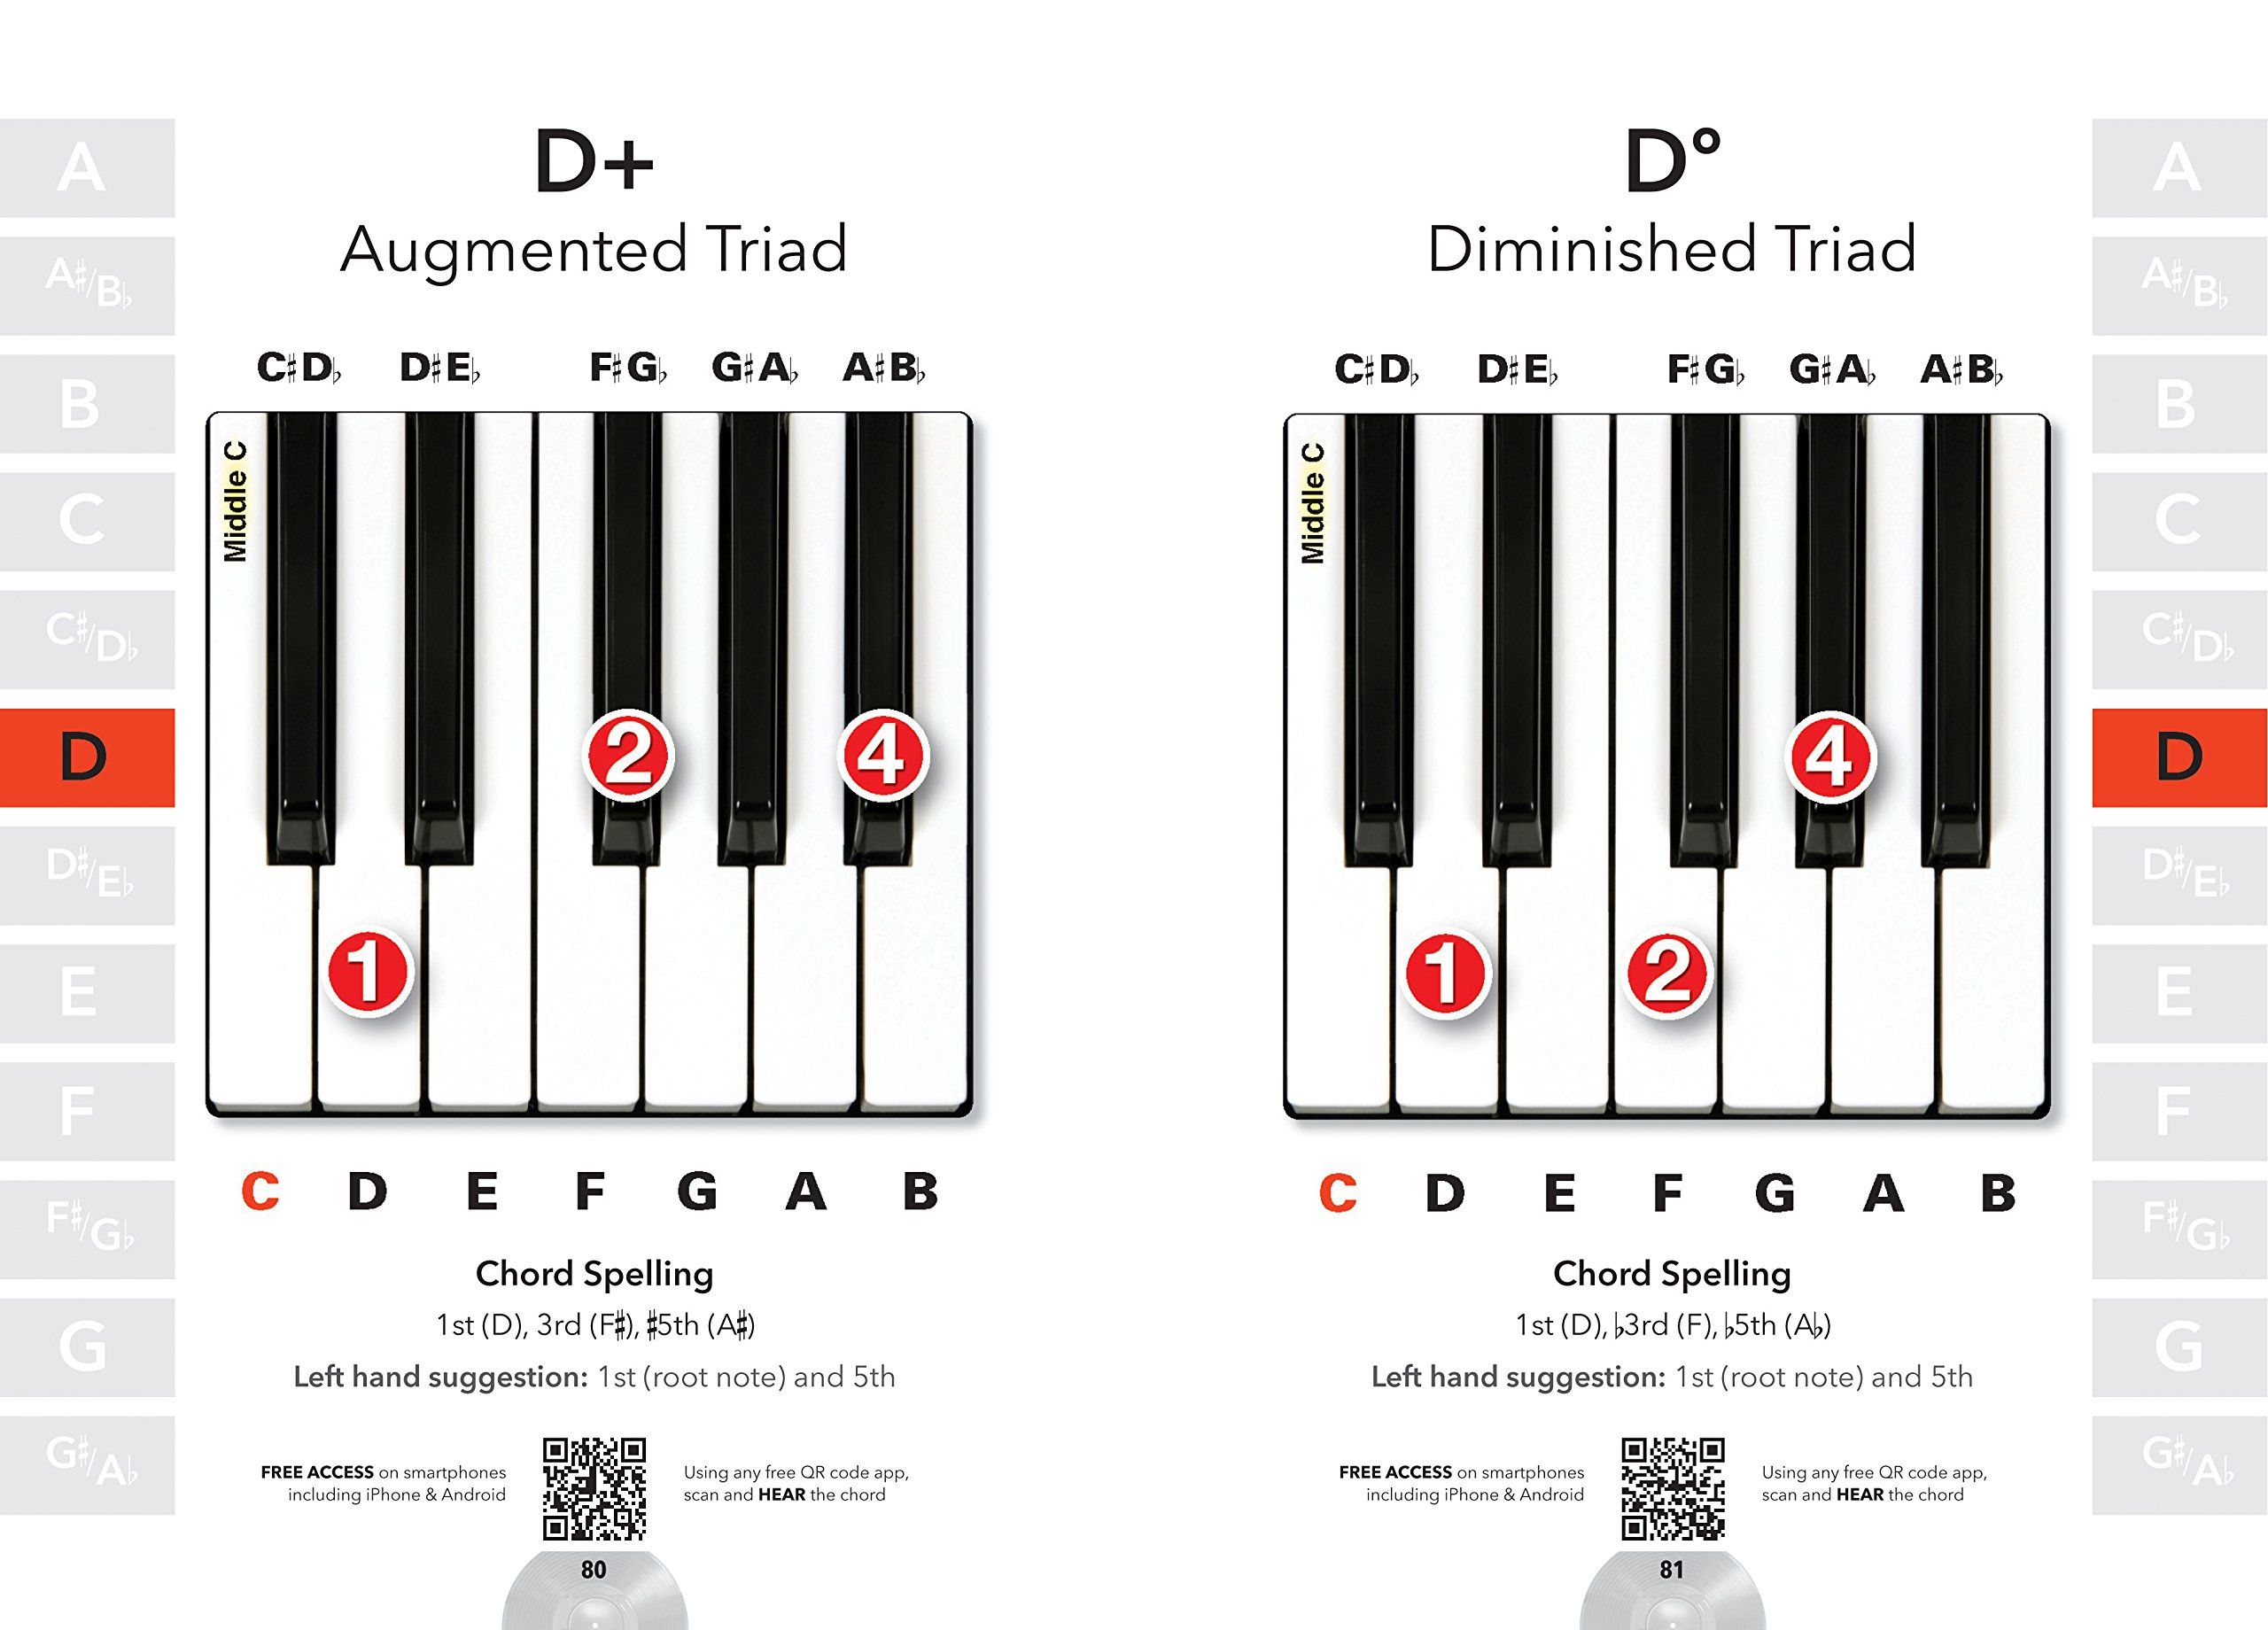 Piano chords pick up play jake jackson 9781783619214 amazon piano chords pick up play jake jackson 9781783619214 amazon books hexwebz Choice Image